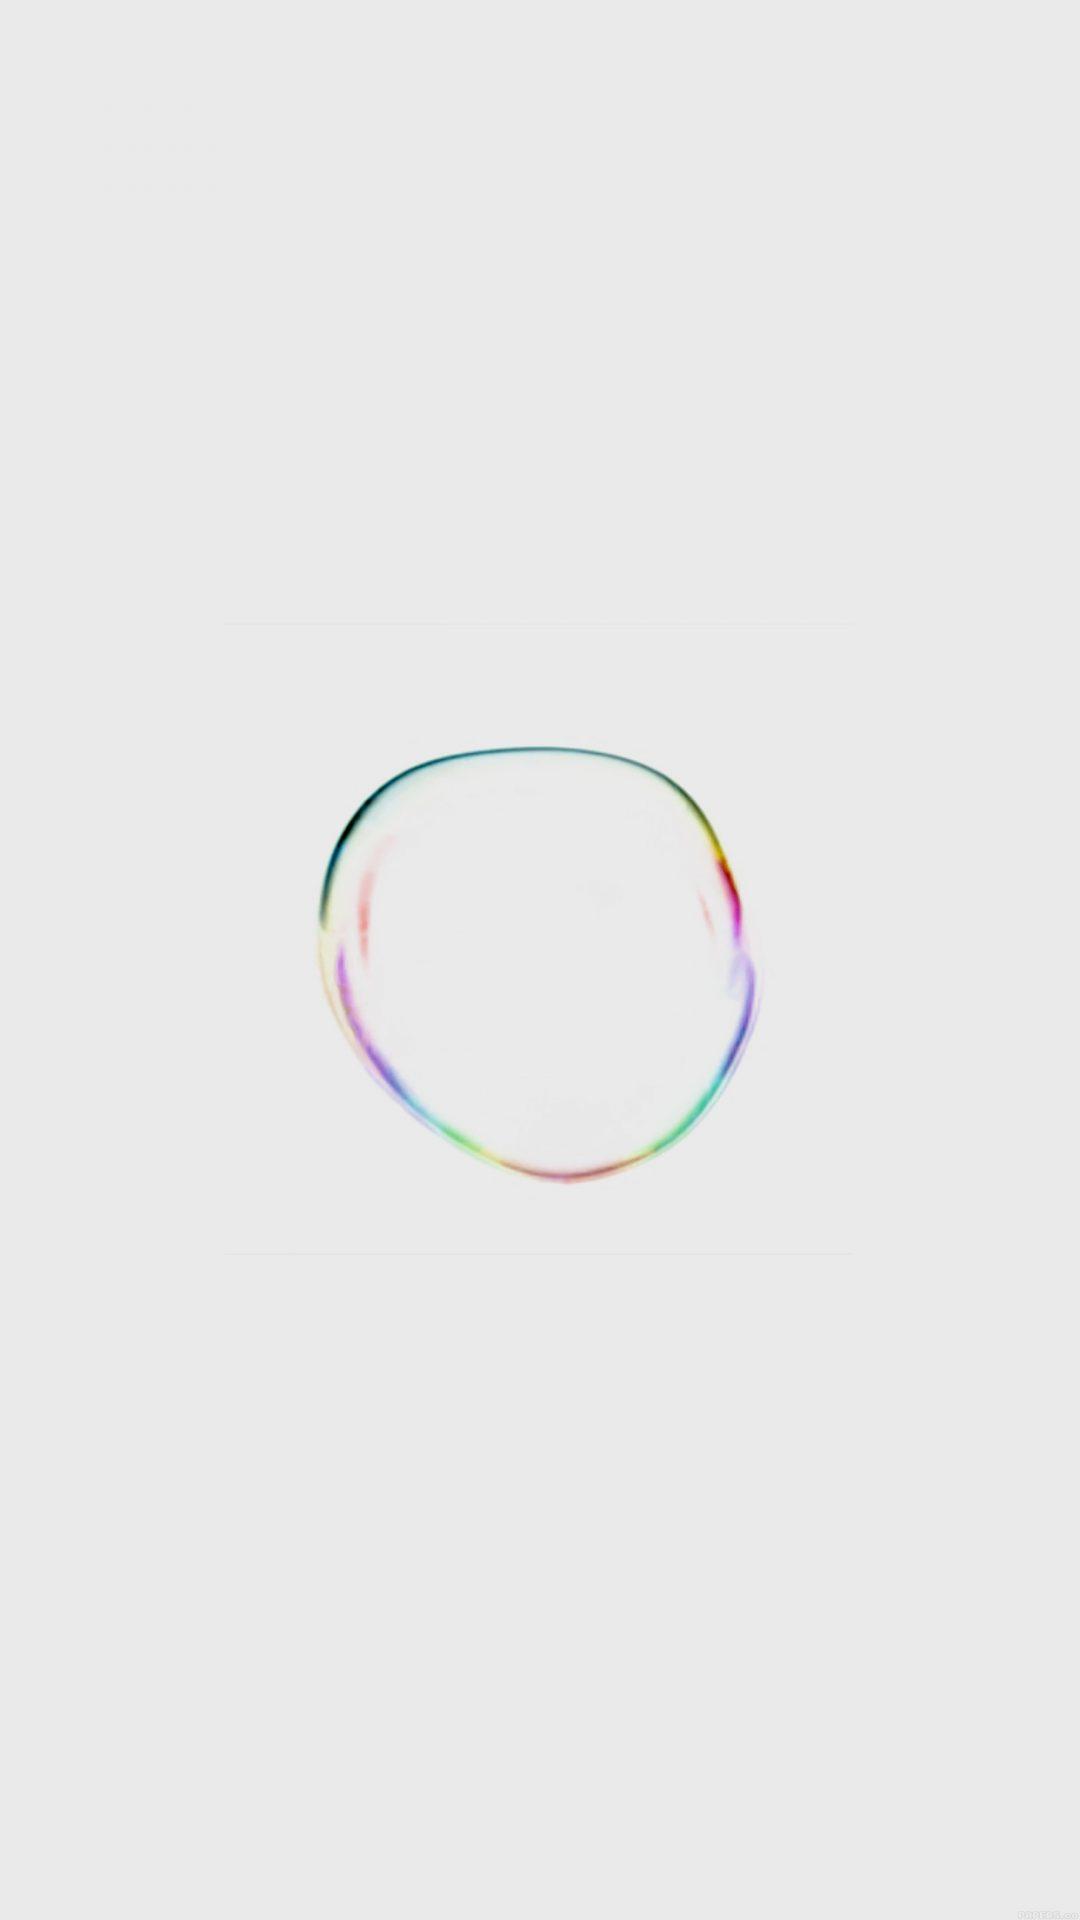 Apple Macbook Art Bubble White